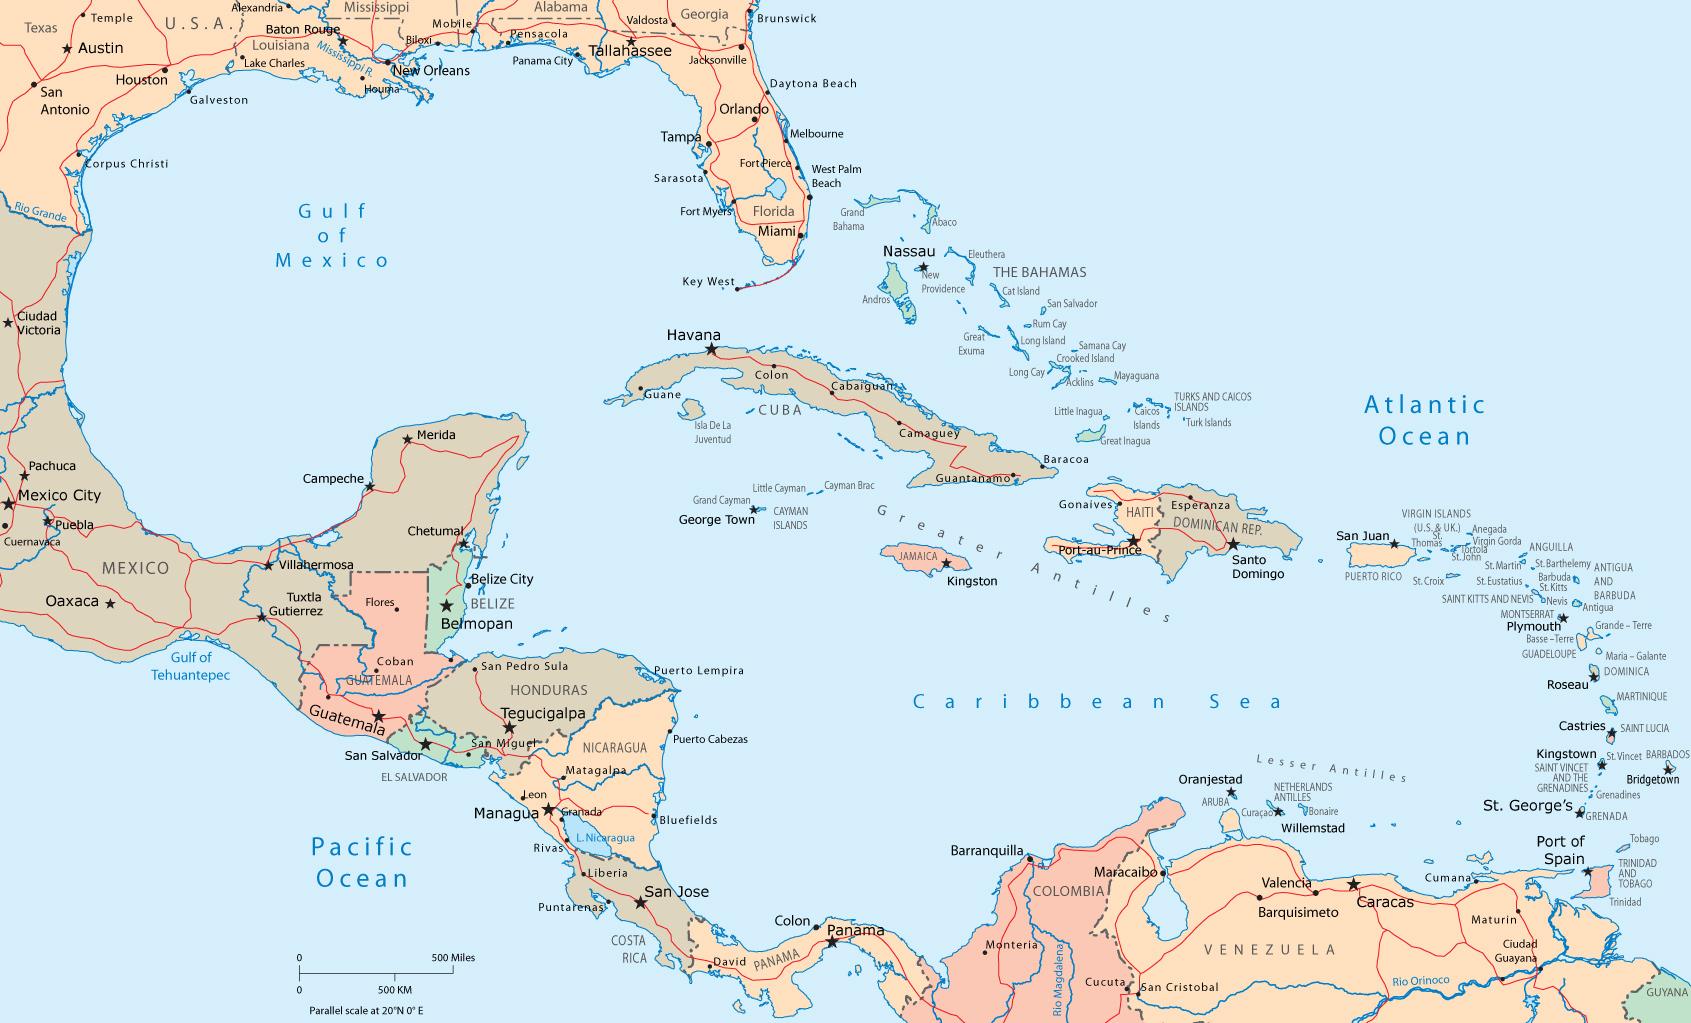 karibien karta Kartor Karibien. Maps Caribbean karibien karta